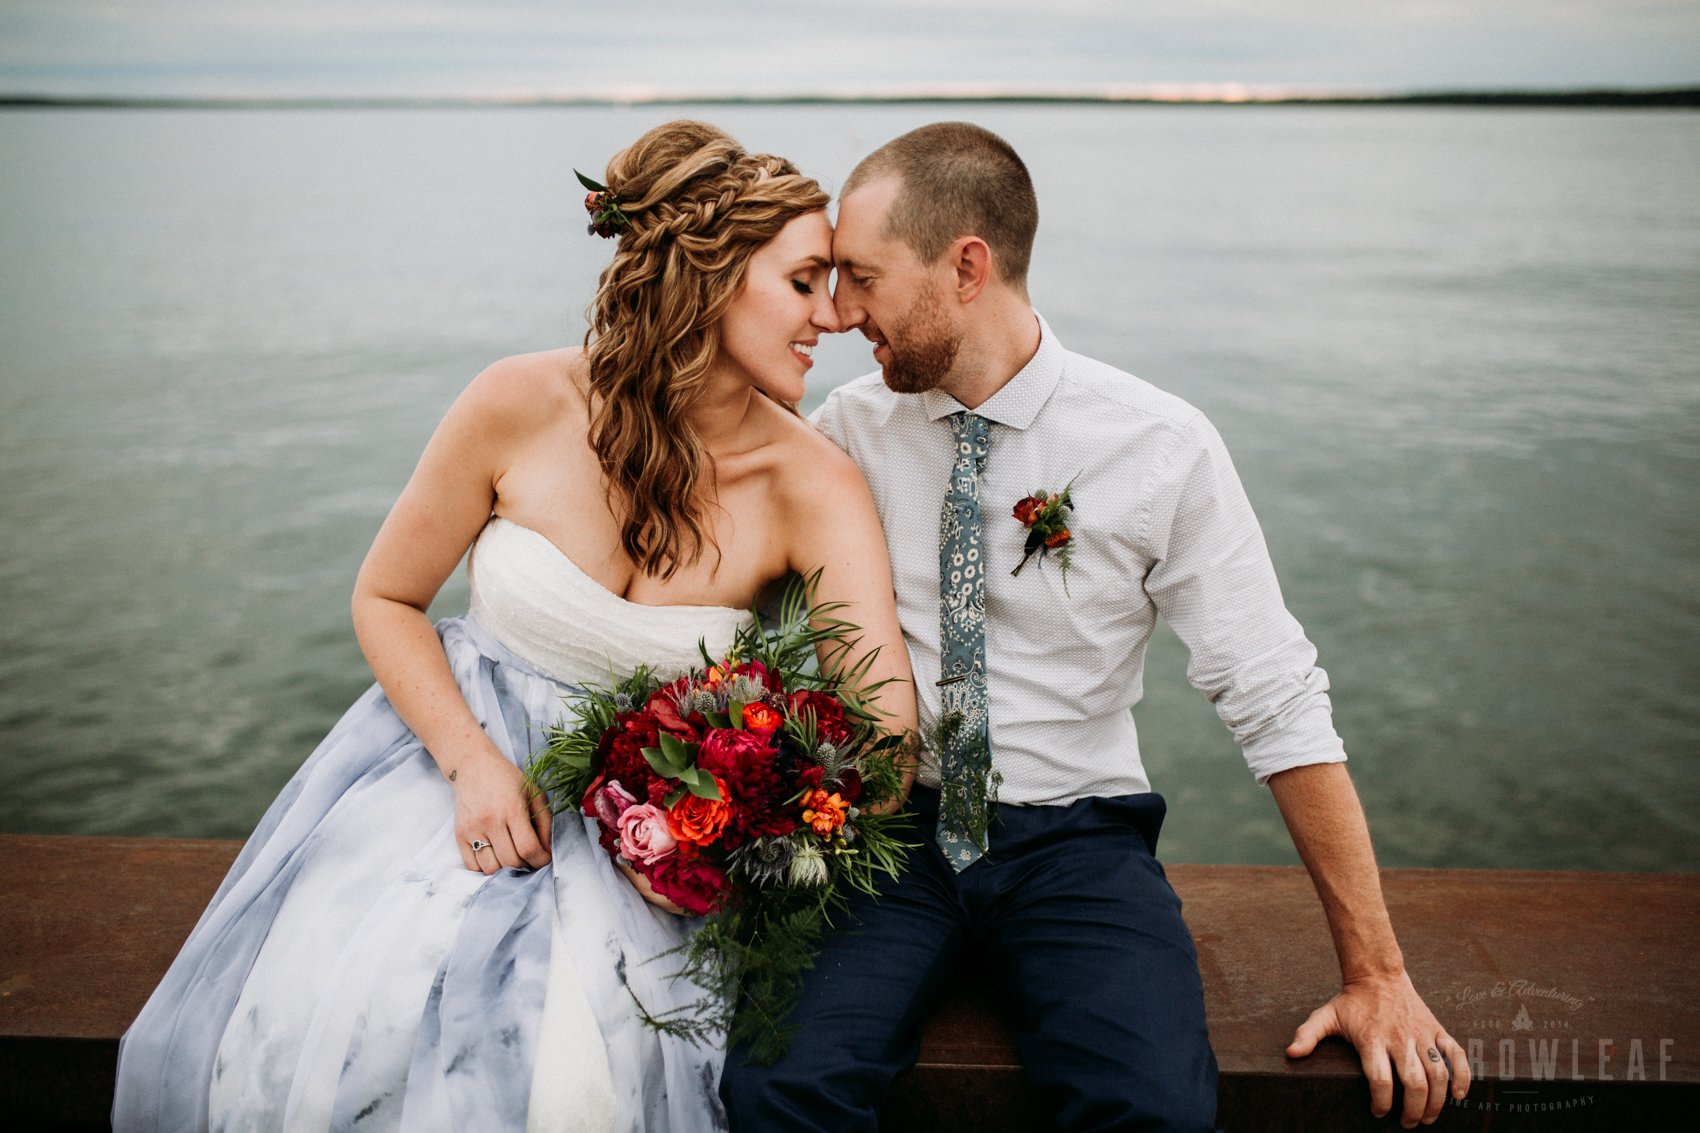 bayfield-wi-lake-superior-wedding-moody-styled-bride-groom-photos-15.jpg